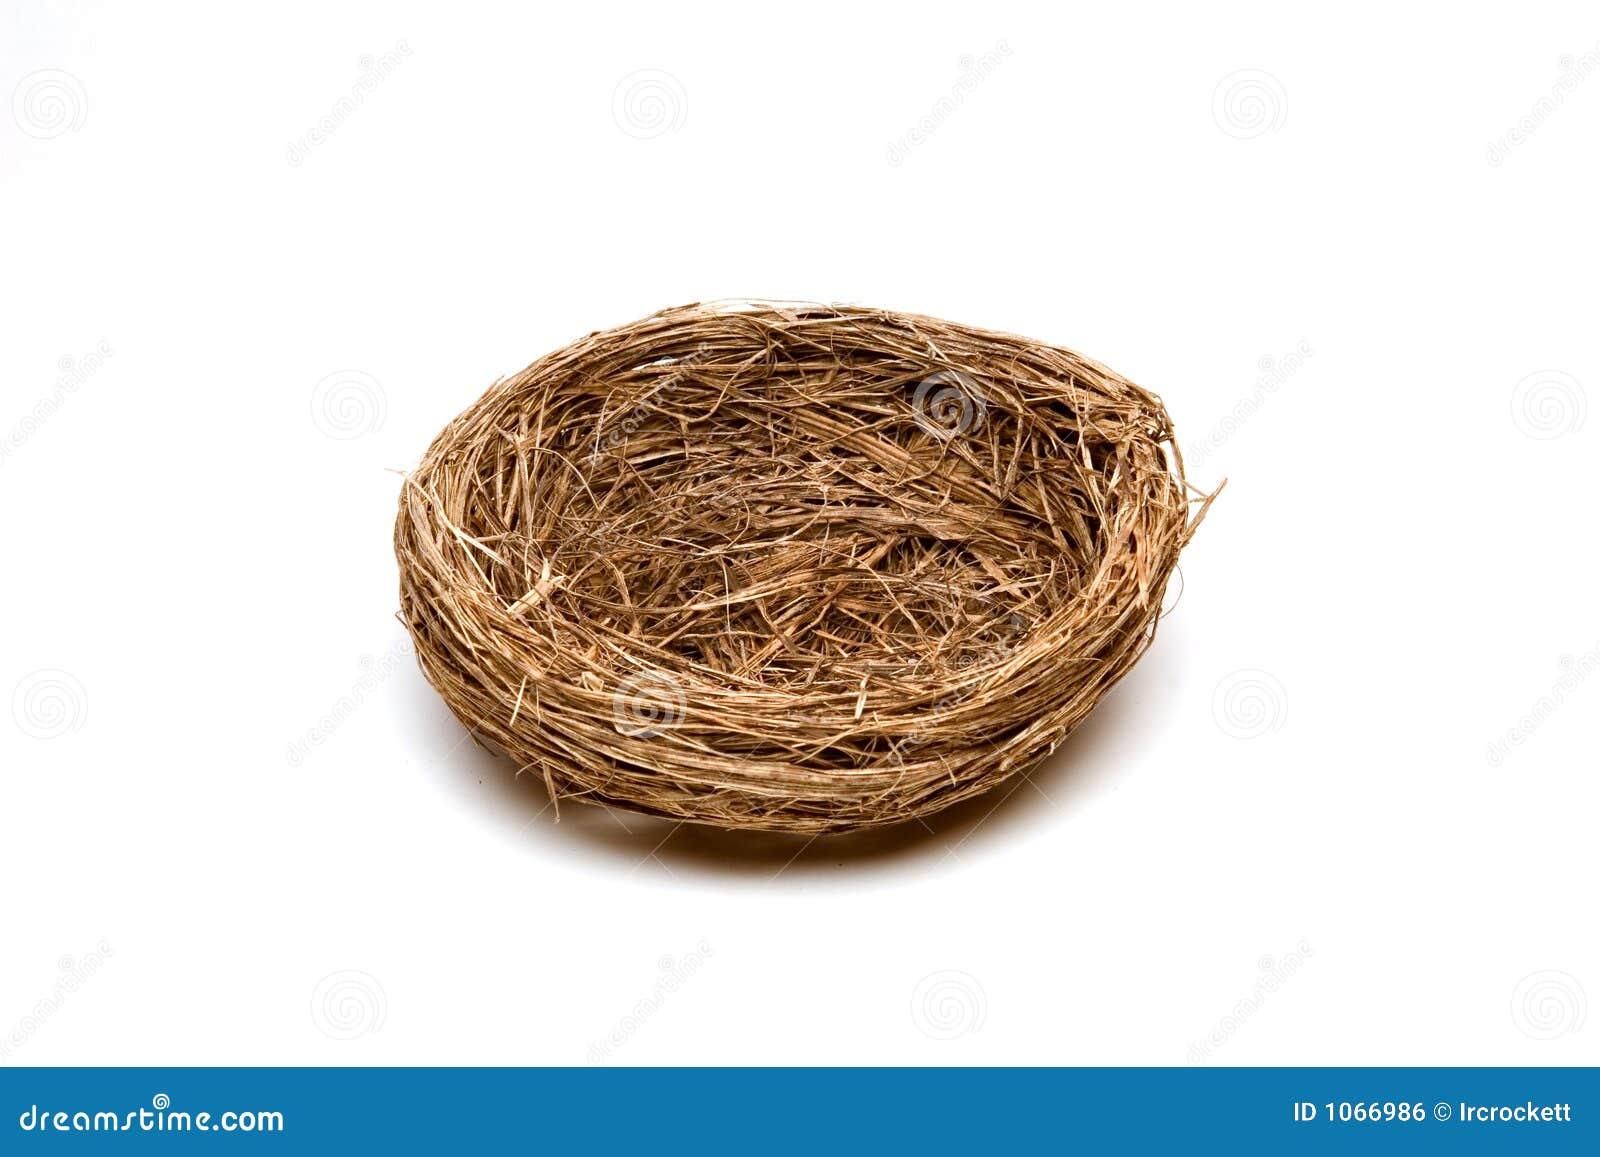 I Love You Heart Wallpaper 3d Empty Nest Royalty Fre...